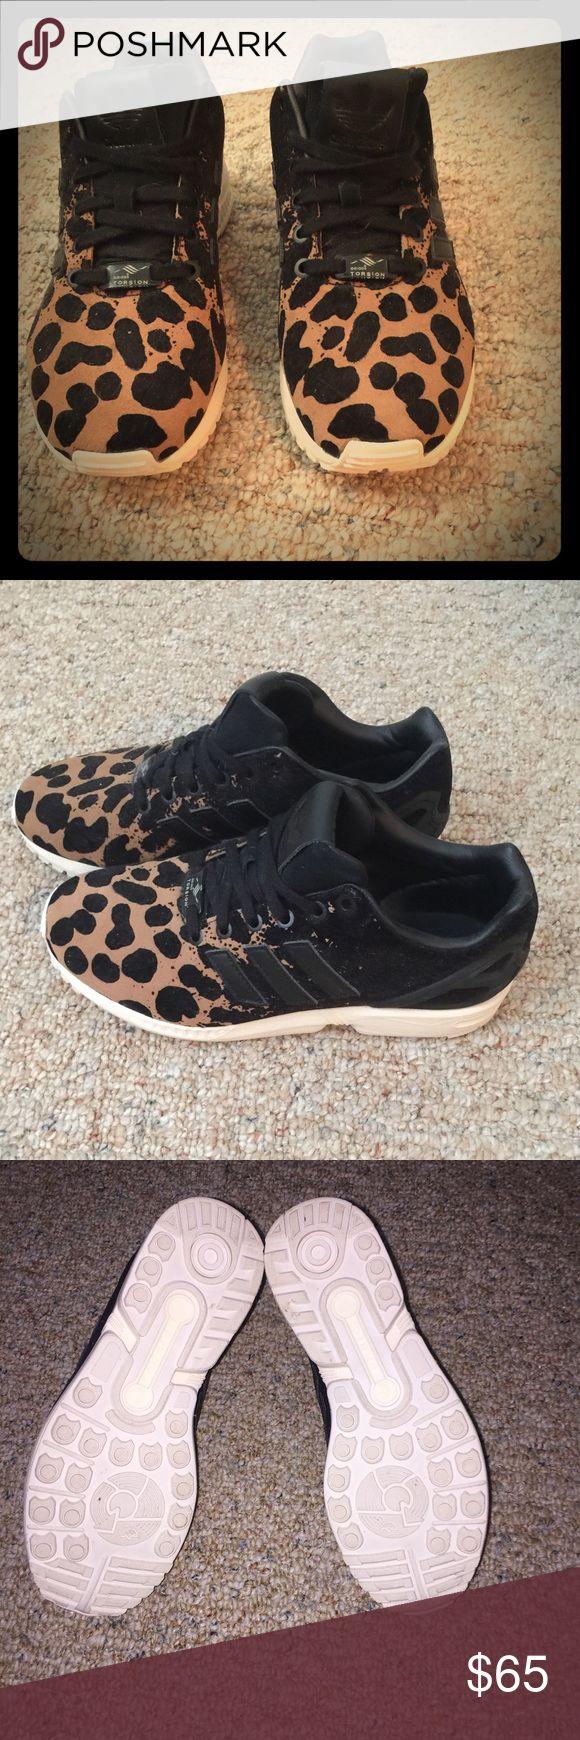 Adidas ZX Flux leopard print running shoes. Size 8 Adidas running shoes. Worn once. adidas Shoes Sneakers